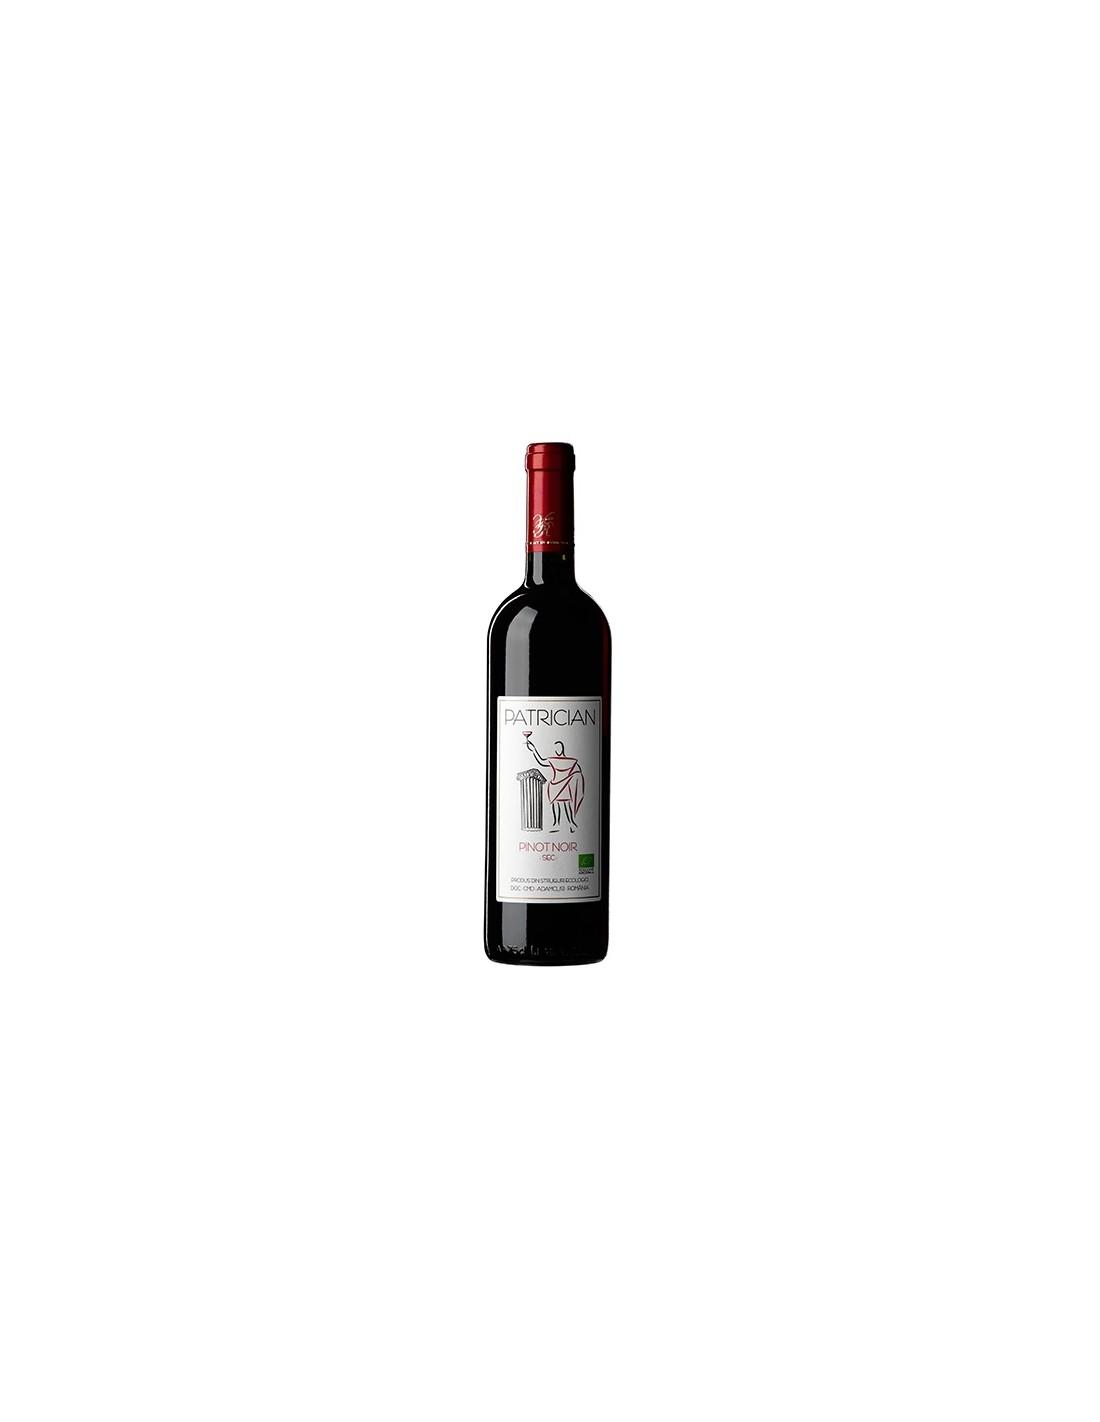 Vin rosu sec, Pinot Noir, Patrician Adamclisi, 0.75L, 13% alc., Romania